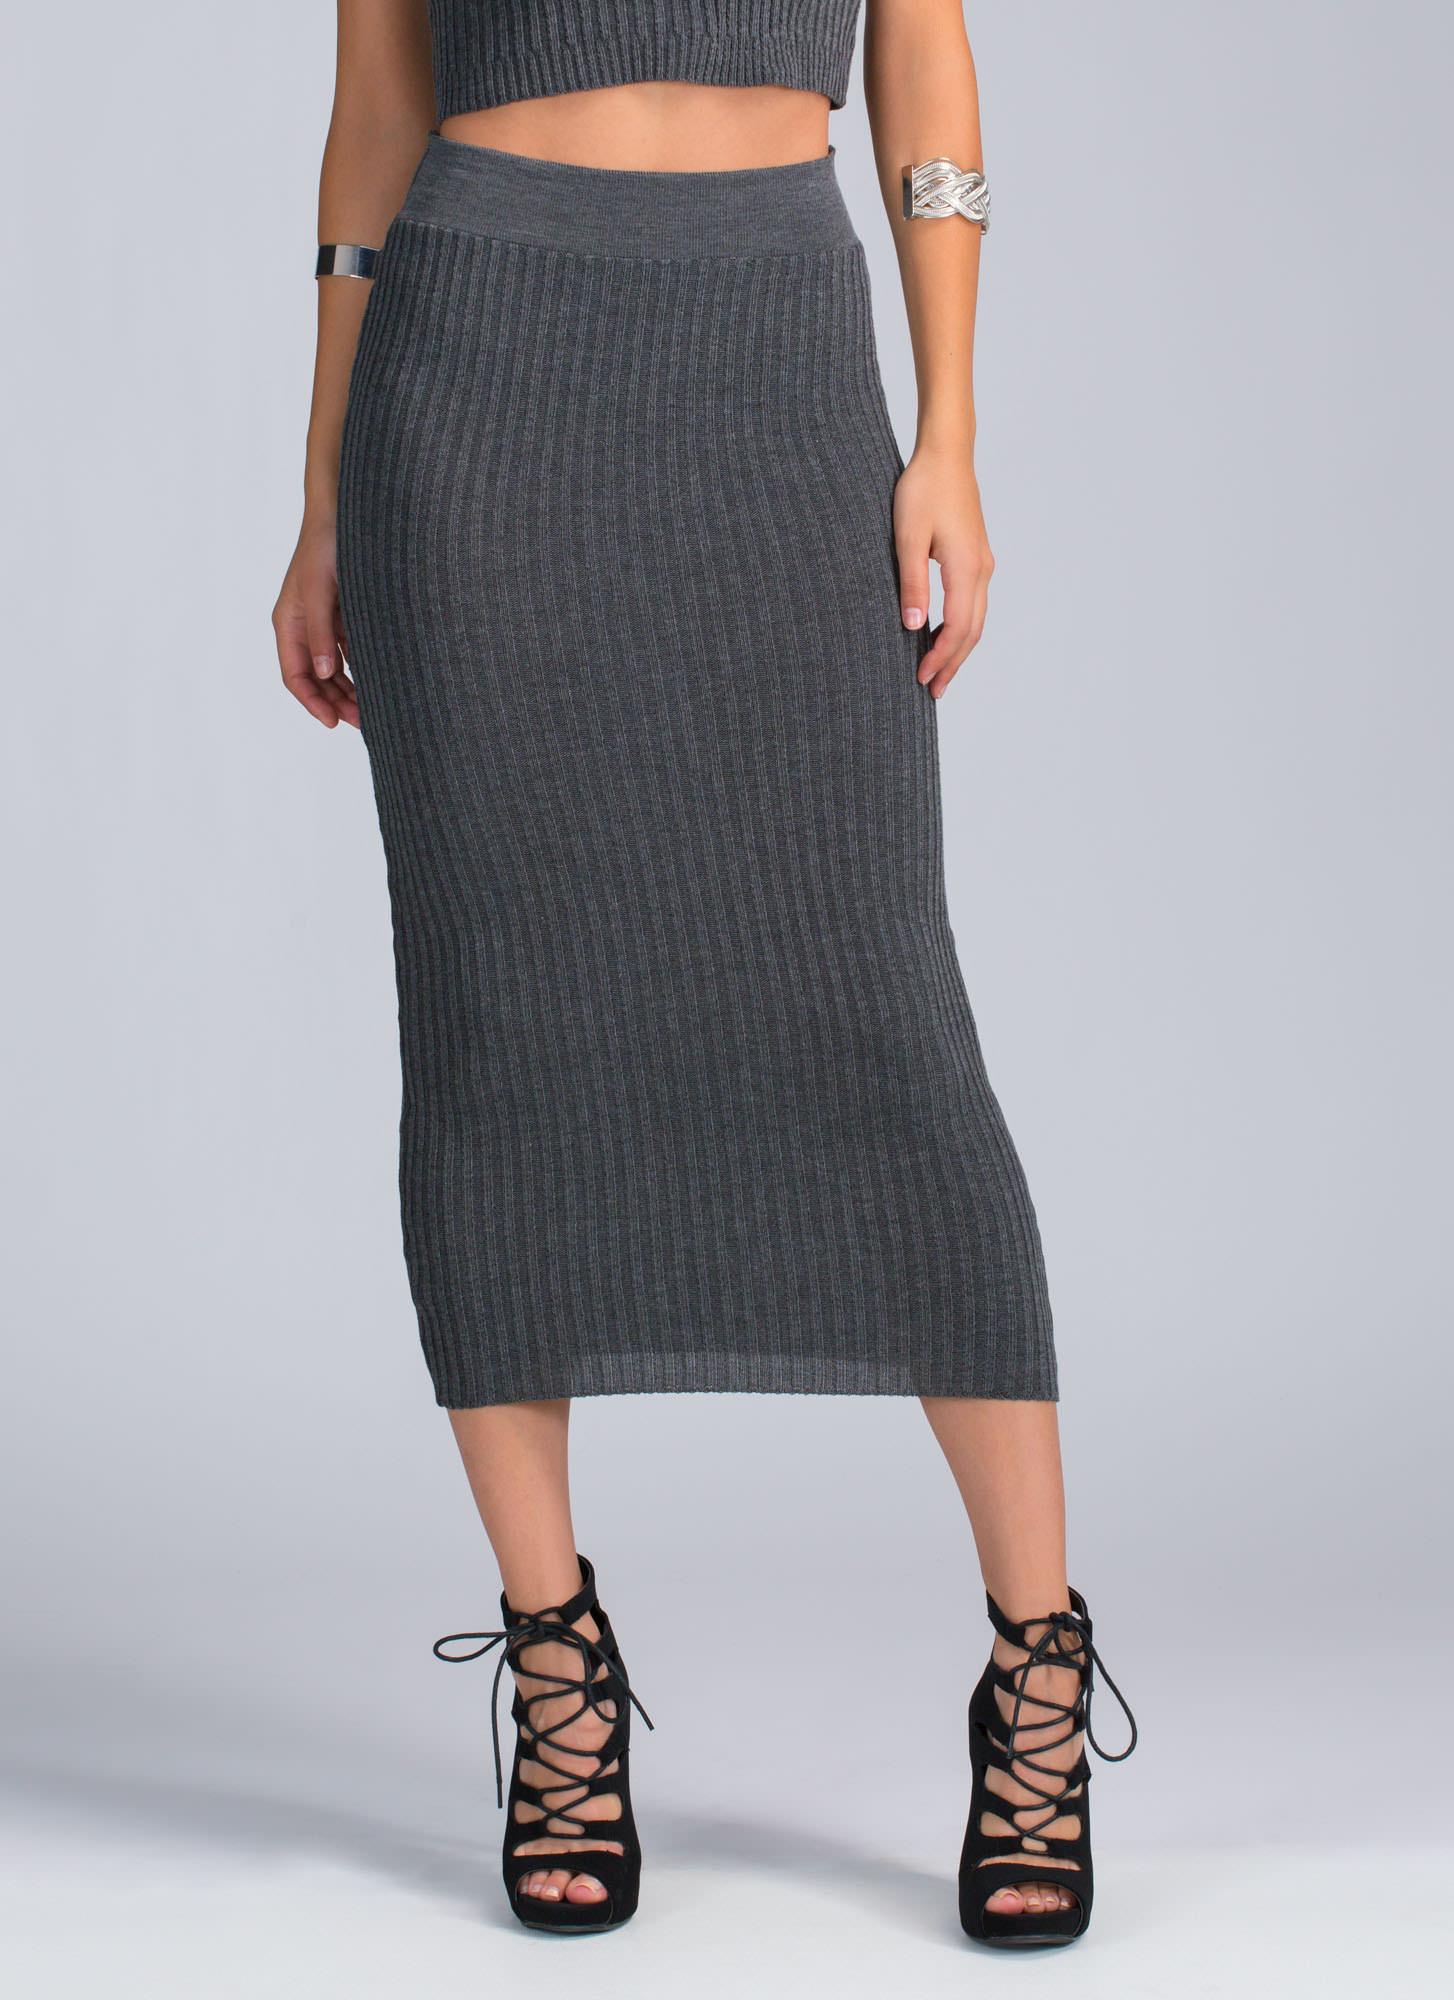 Baby Rib Knit Midi Skirt BURGUNDY OLIVE CHARCOAL - GoJane.com